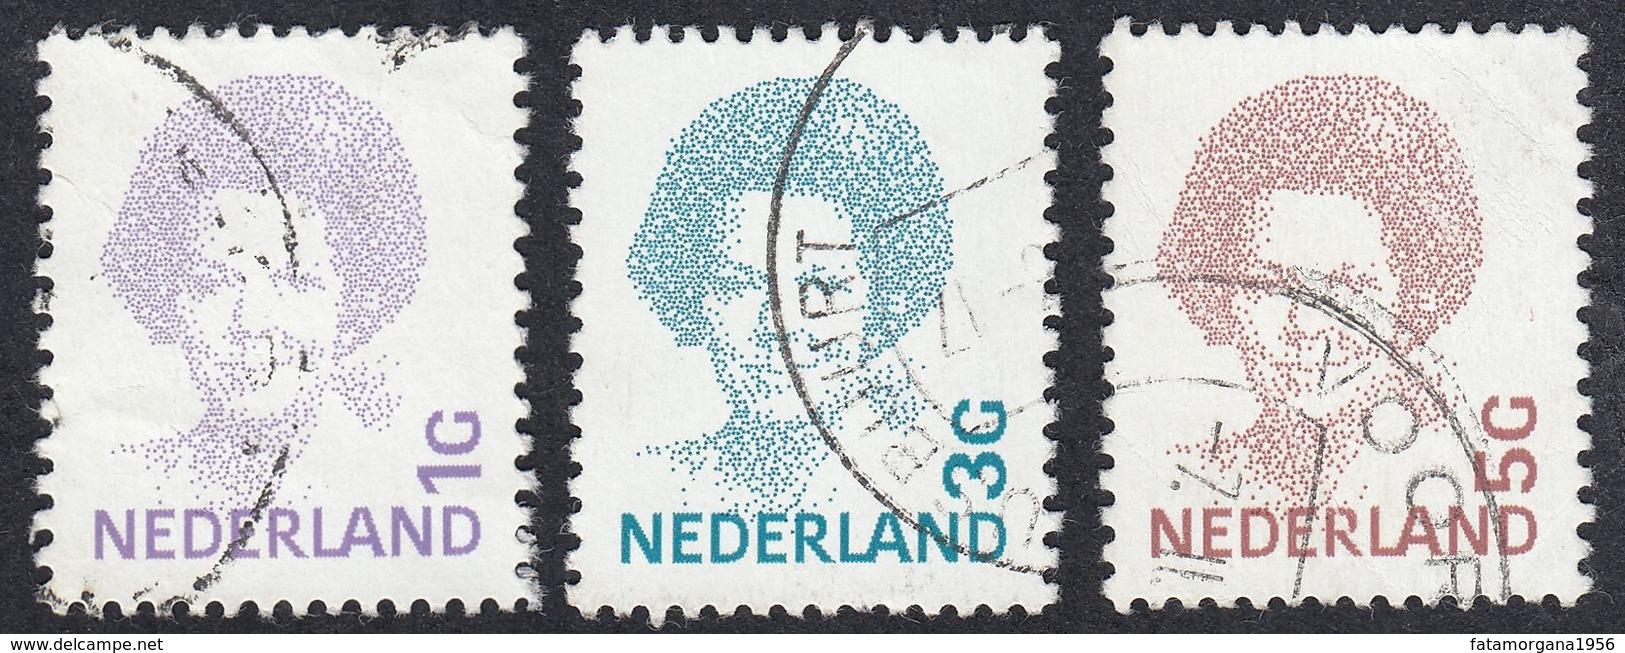 NEDERLAND - PAYS BAS -  OLANDA - 1992 - Lotto 3 Valori Usati: Yvert 1415, 1417 E 1418. - Gebraucht